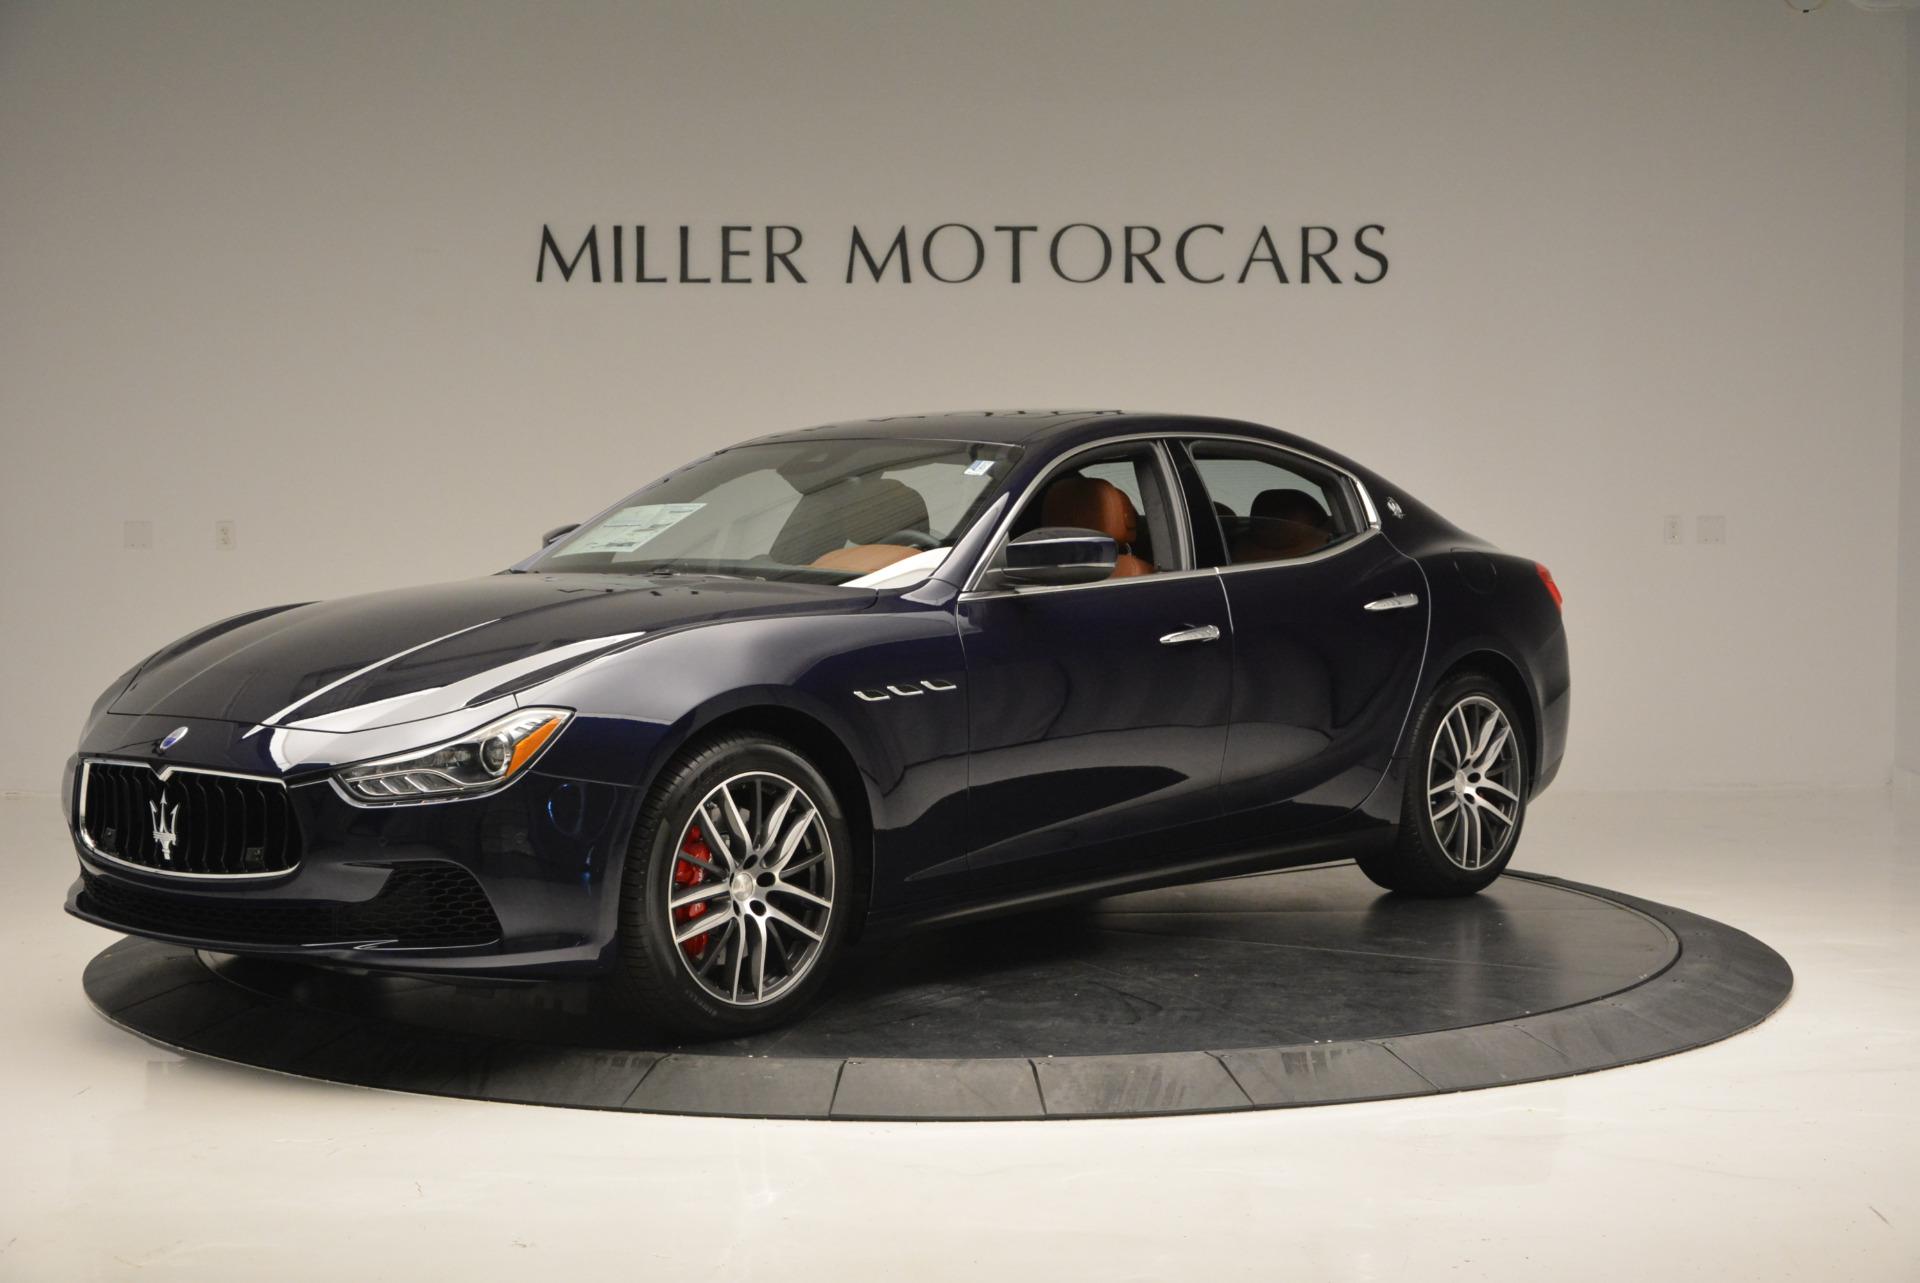 Used 2017 Maserati Ghibli S Q4 - EX Loaner For Sale In Greenwich, CT 567_p2